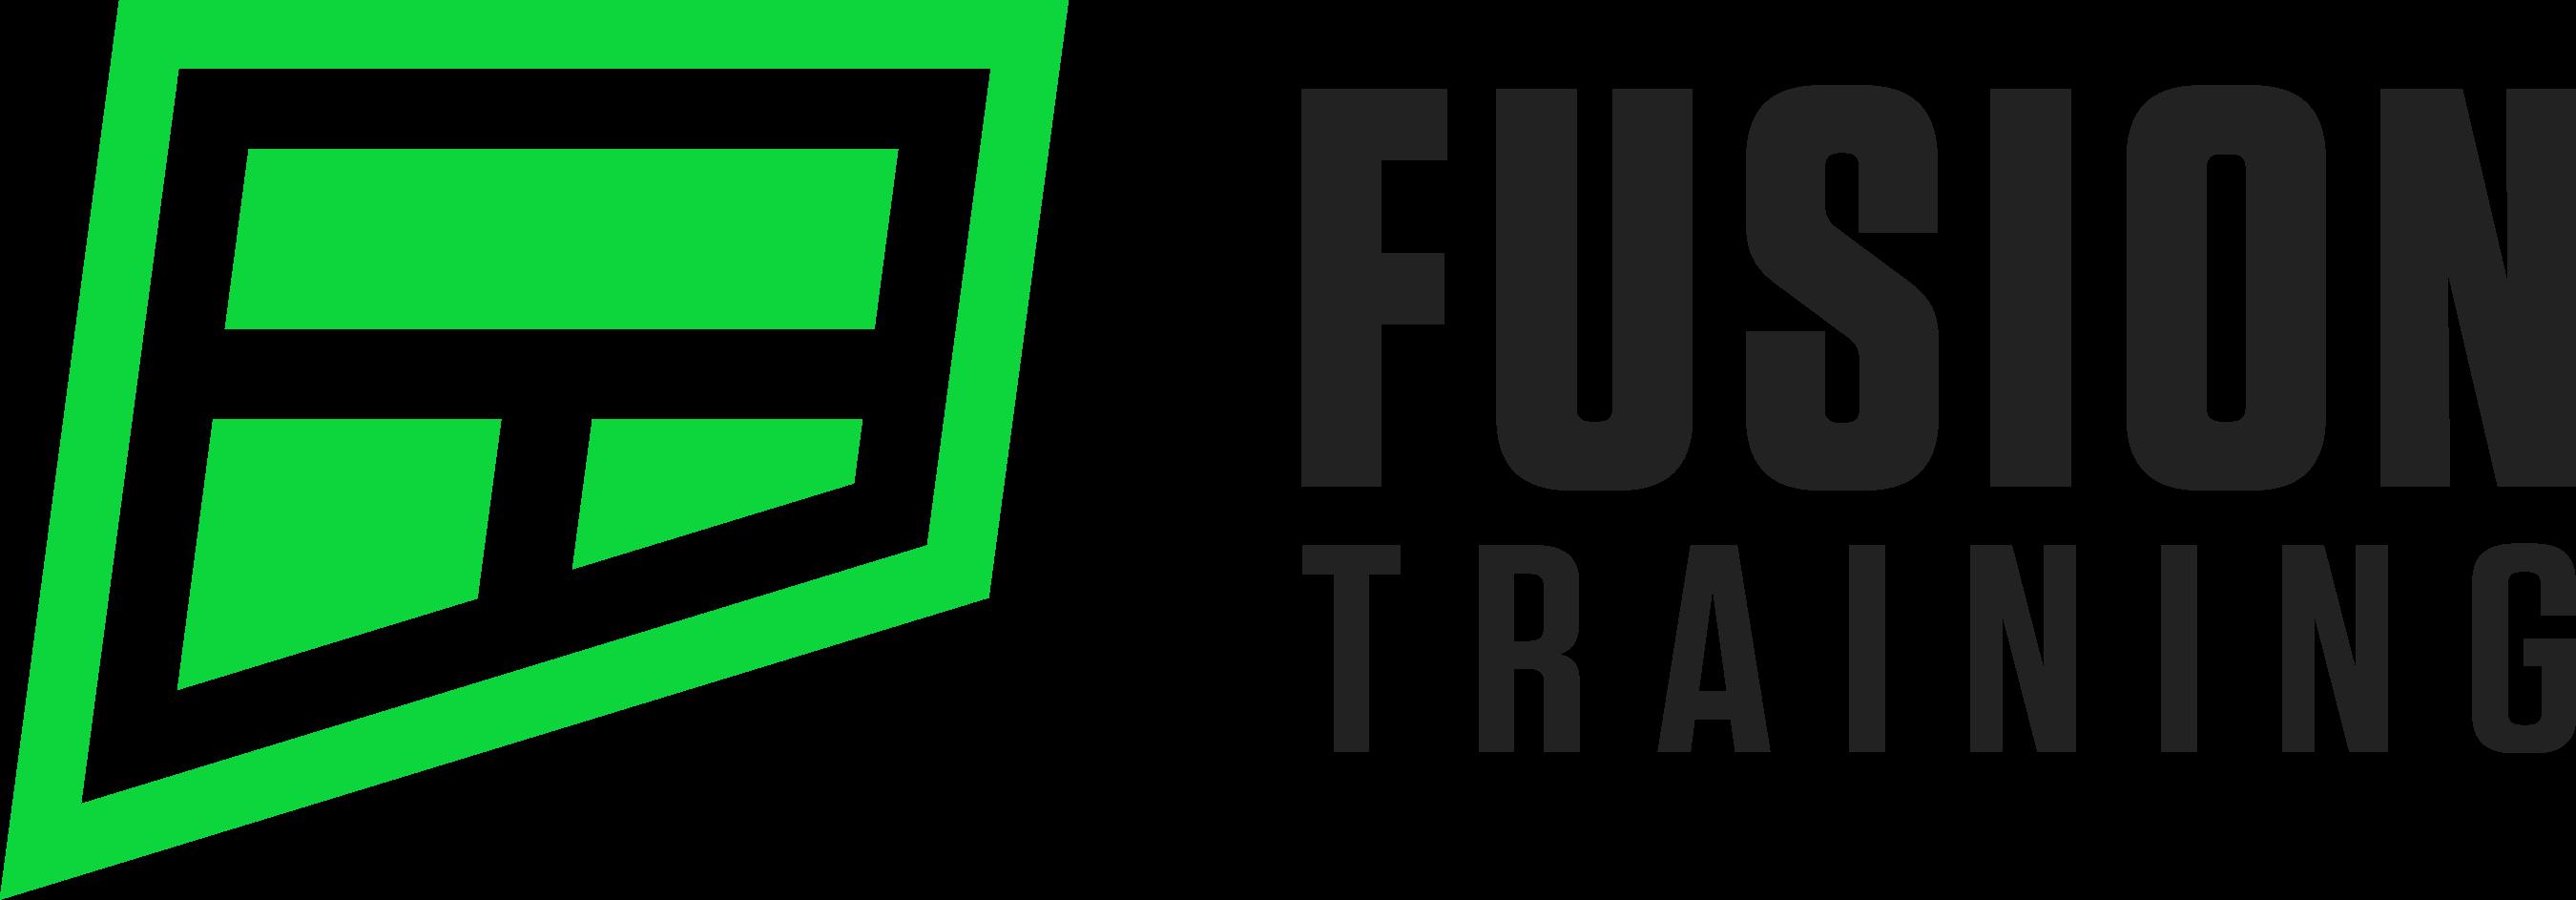 Fusion Training logo